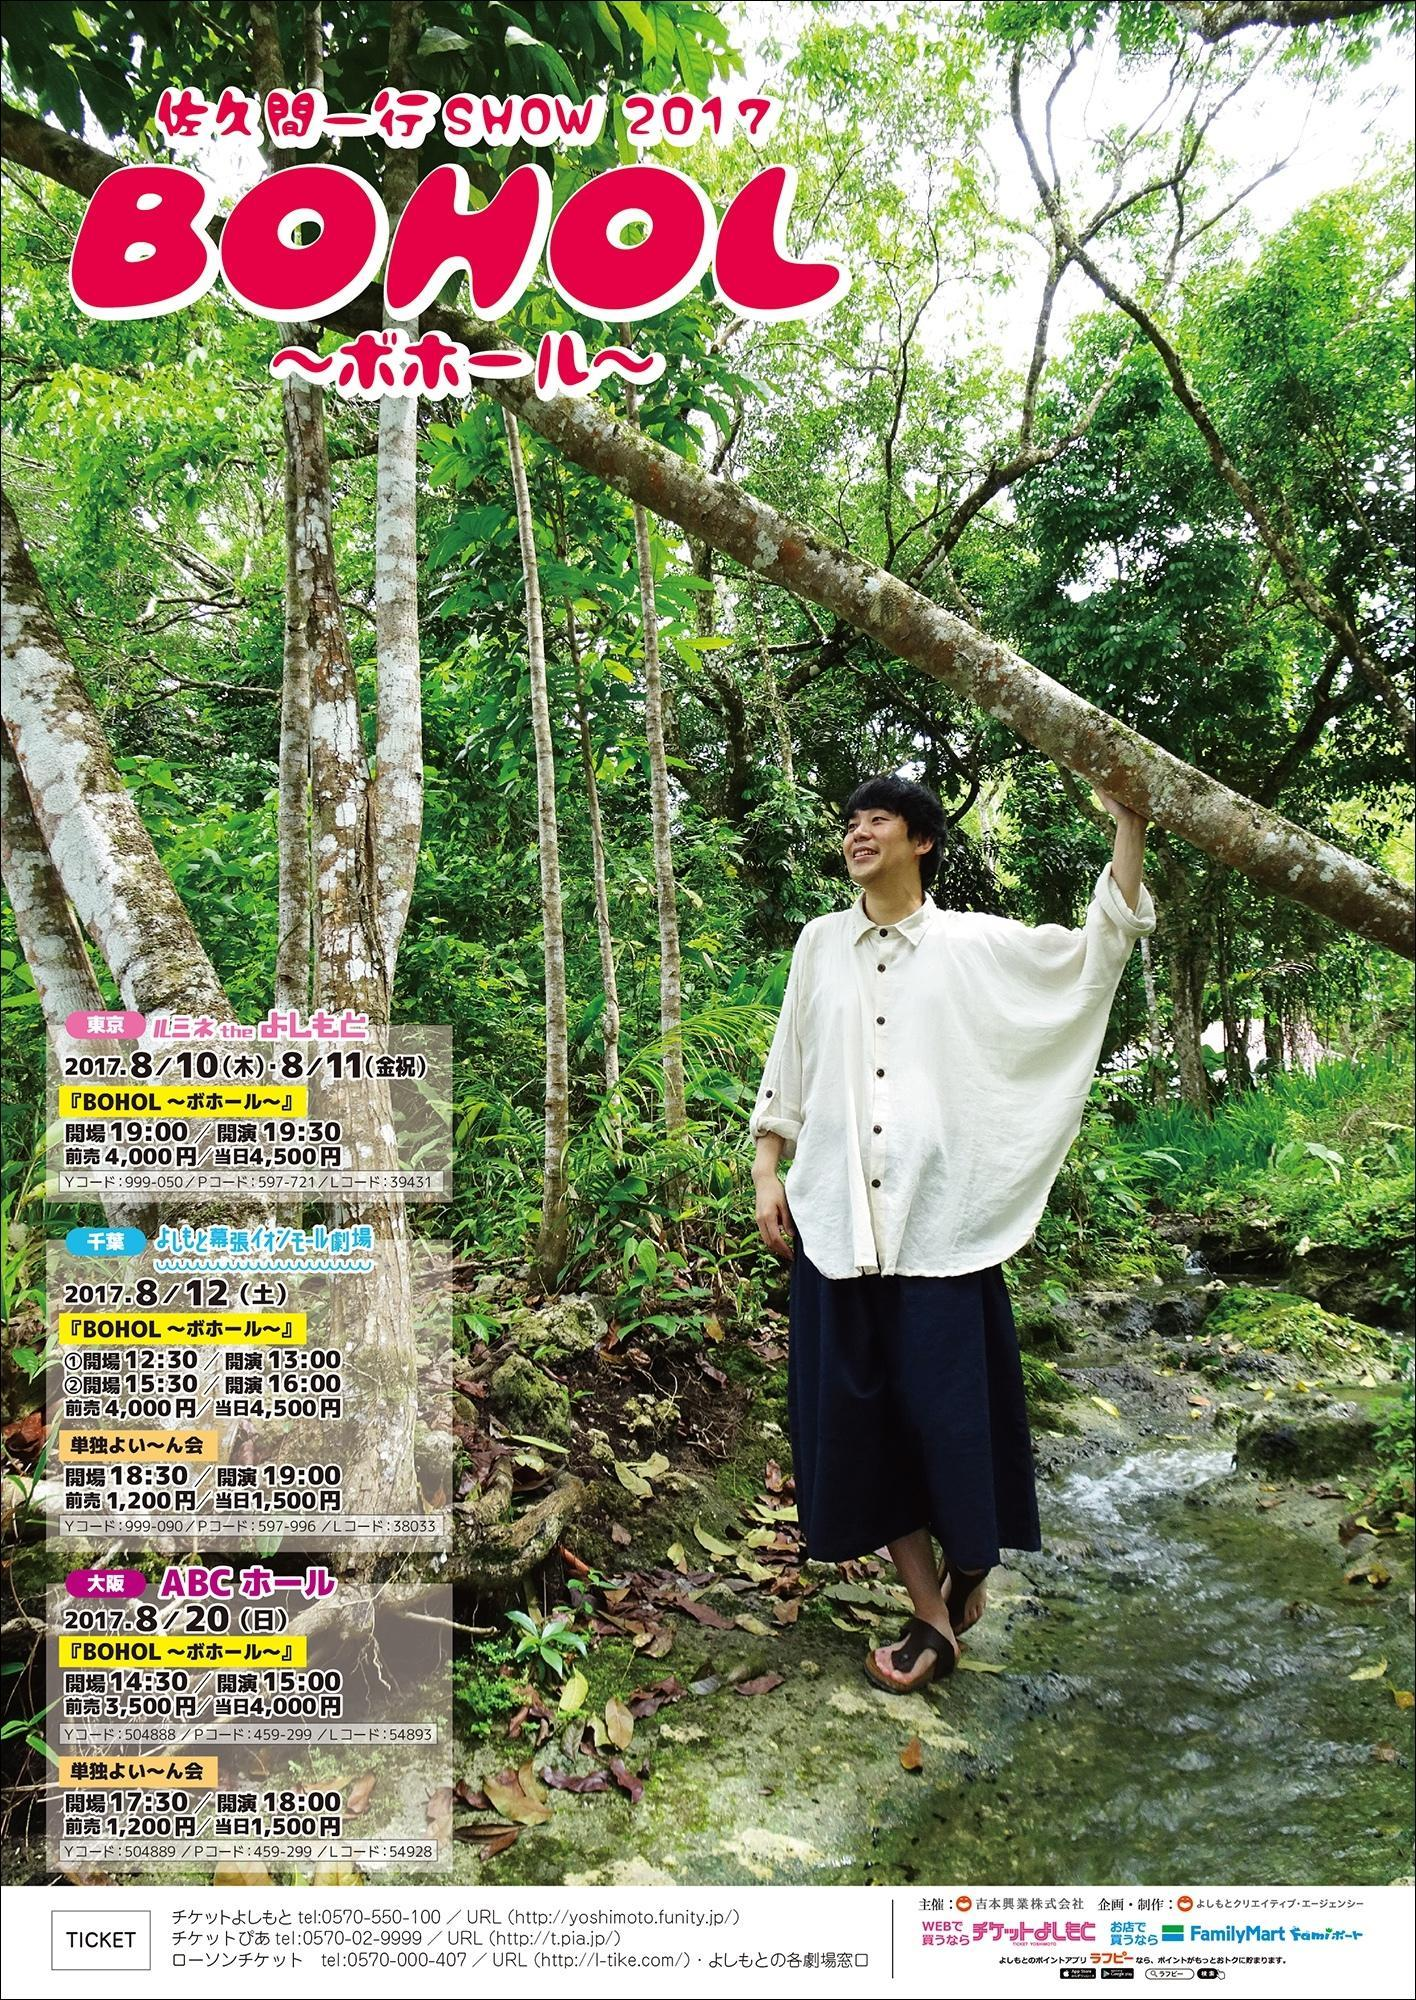 http://news.yoshimoto.co.jp/20170804122114-37d1fe59064ca8a4b6df259192053e28ab033533.jpg